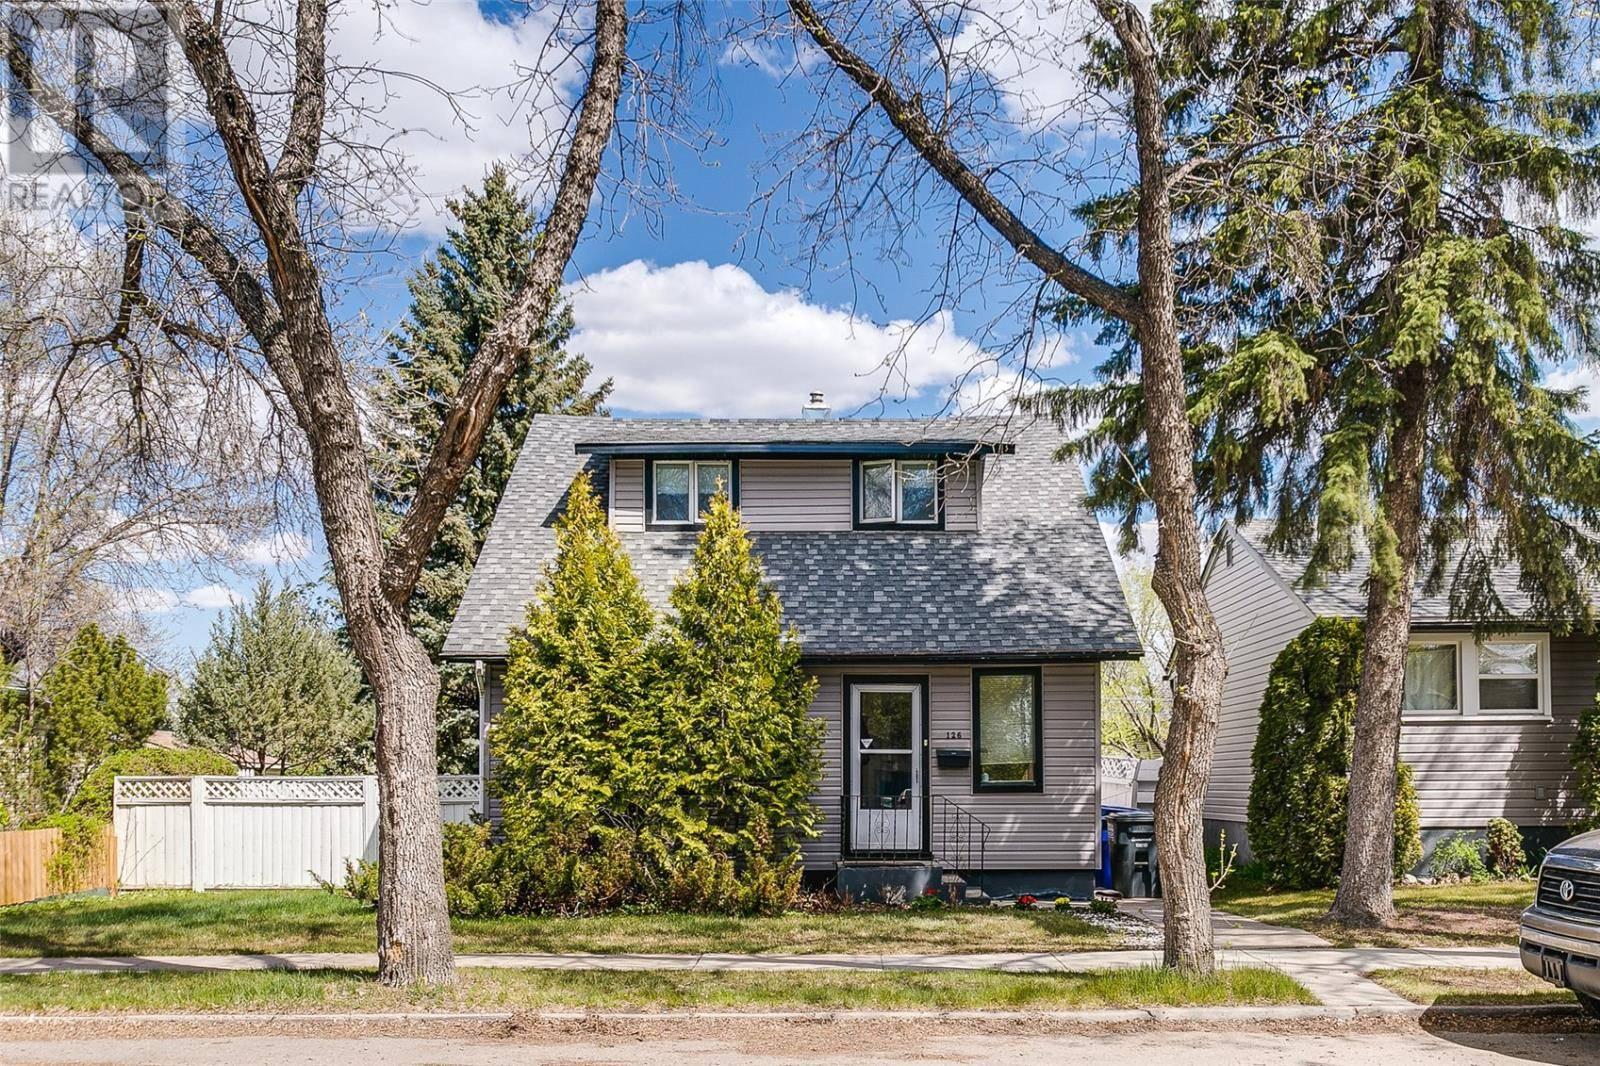 House for sale at 126 109th St W Saskatoon Saskatchewan - MLS: SK772888